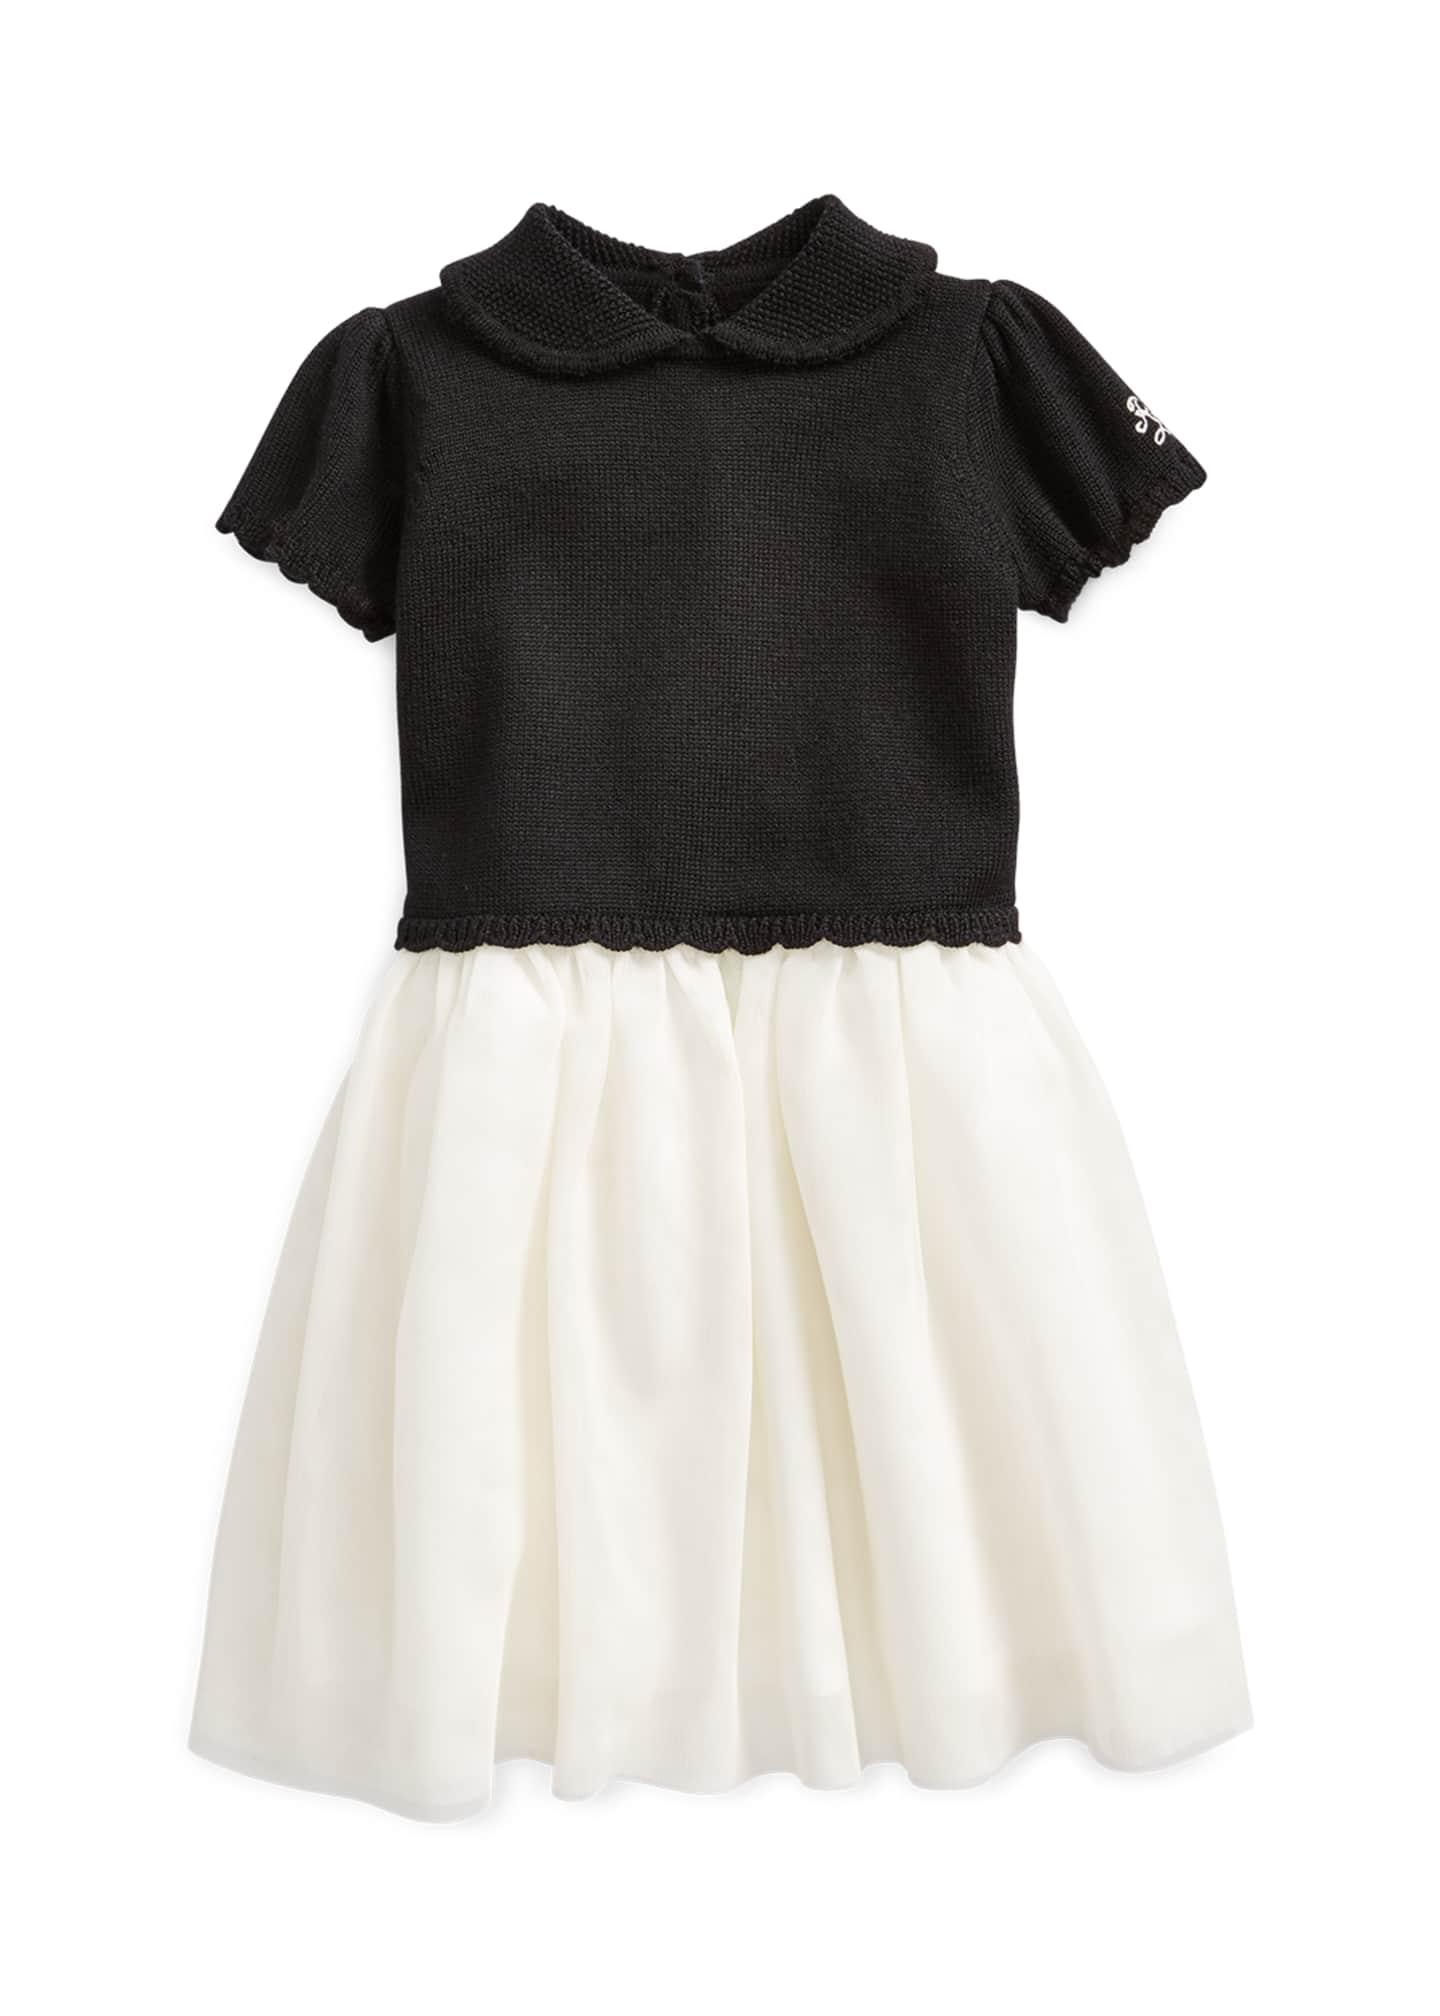 Ralph Lauren Childrenswear Girl's Holiday Sweater Tulle Dress,